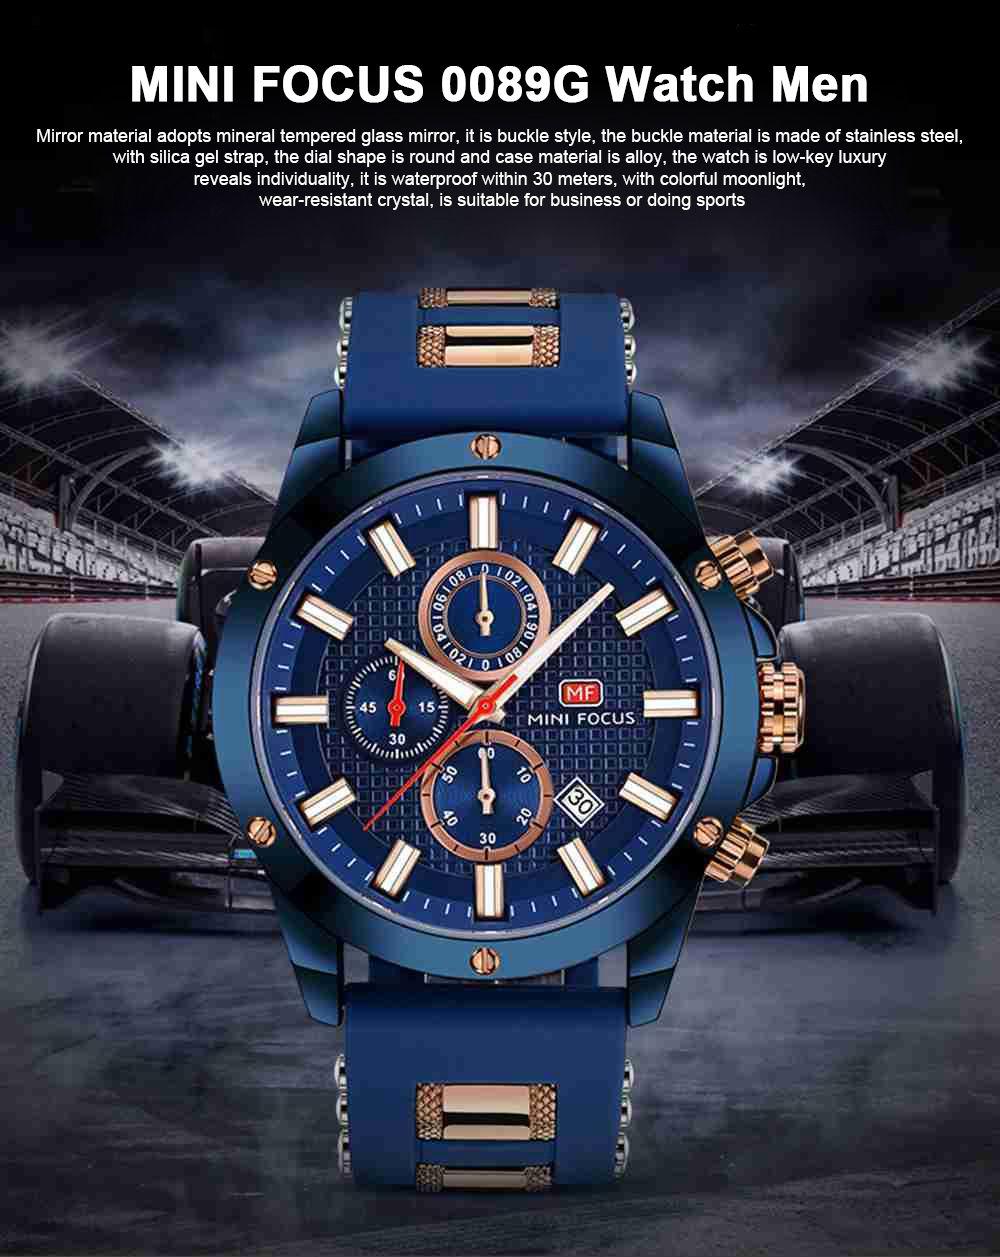 MINI FOCUS Fashion Male Quartz Watch Men Chronograph 3 Sub-dials 6 Hands Calendar Silicone Strap Waterproof 30 Meters Sport WristWatch 0